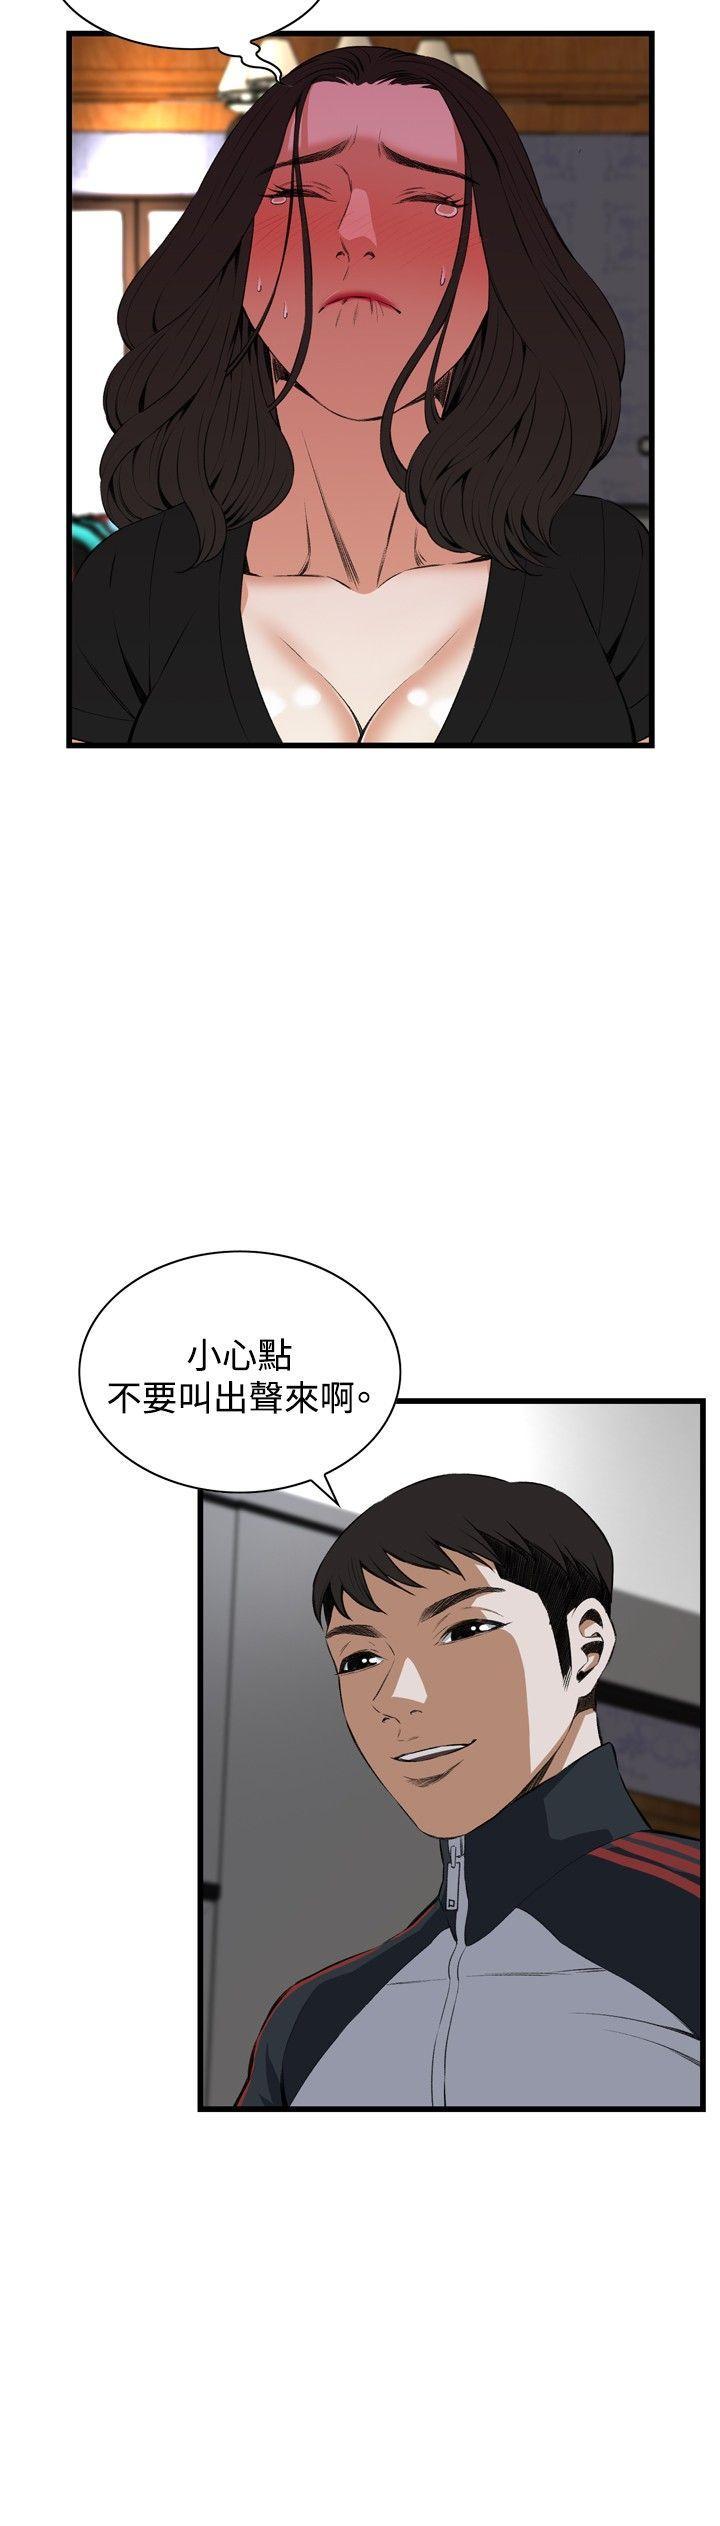 Take a Peek 偷窥 Ch.39~60 [Chinese]中文 579